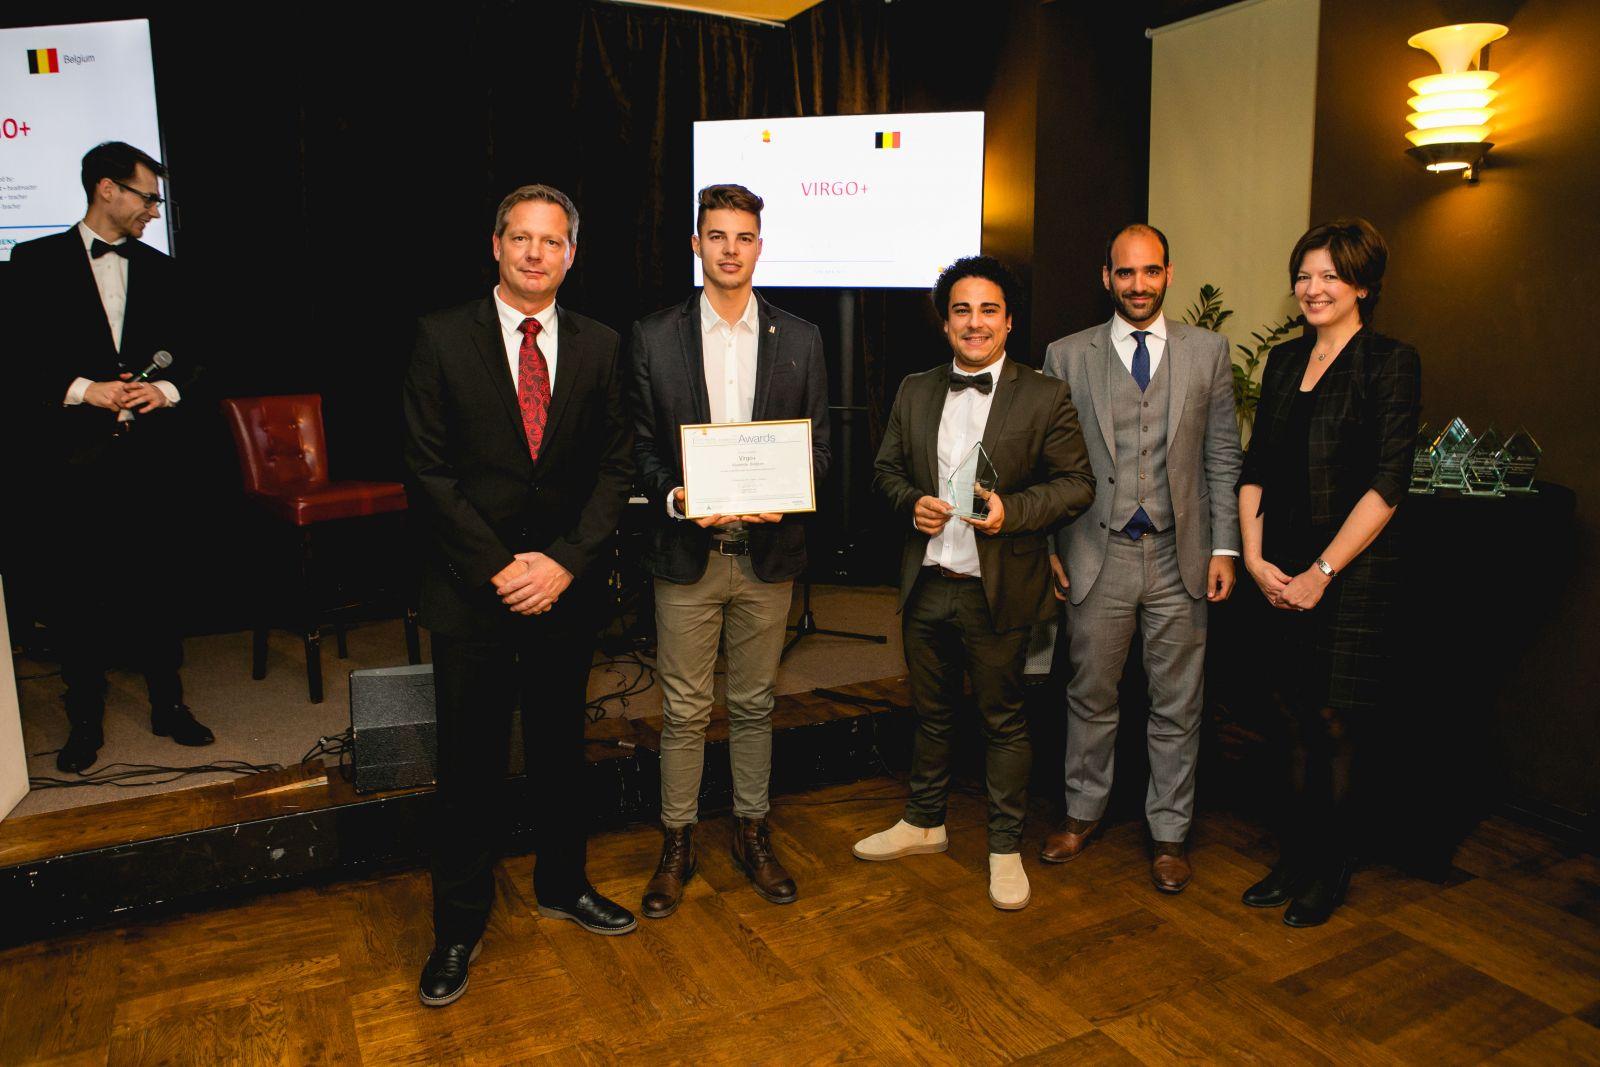 Virgo+ uit Vilvoorde wint Europese prijs 'Ondernemende School'